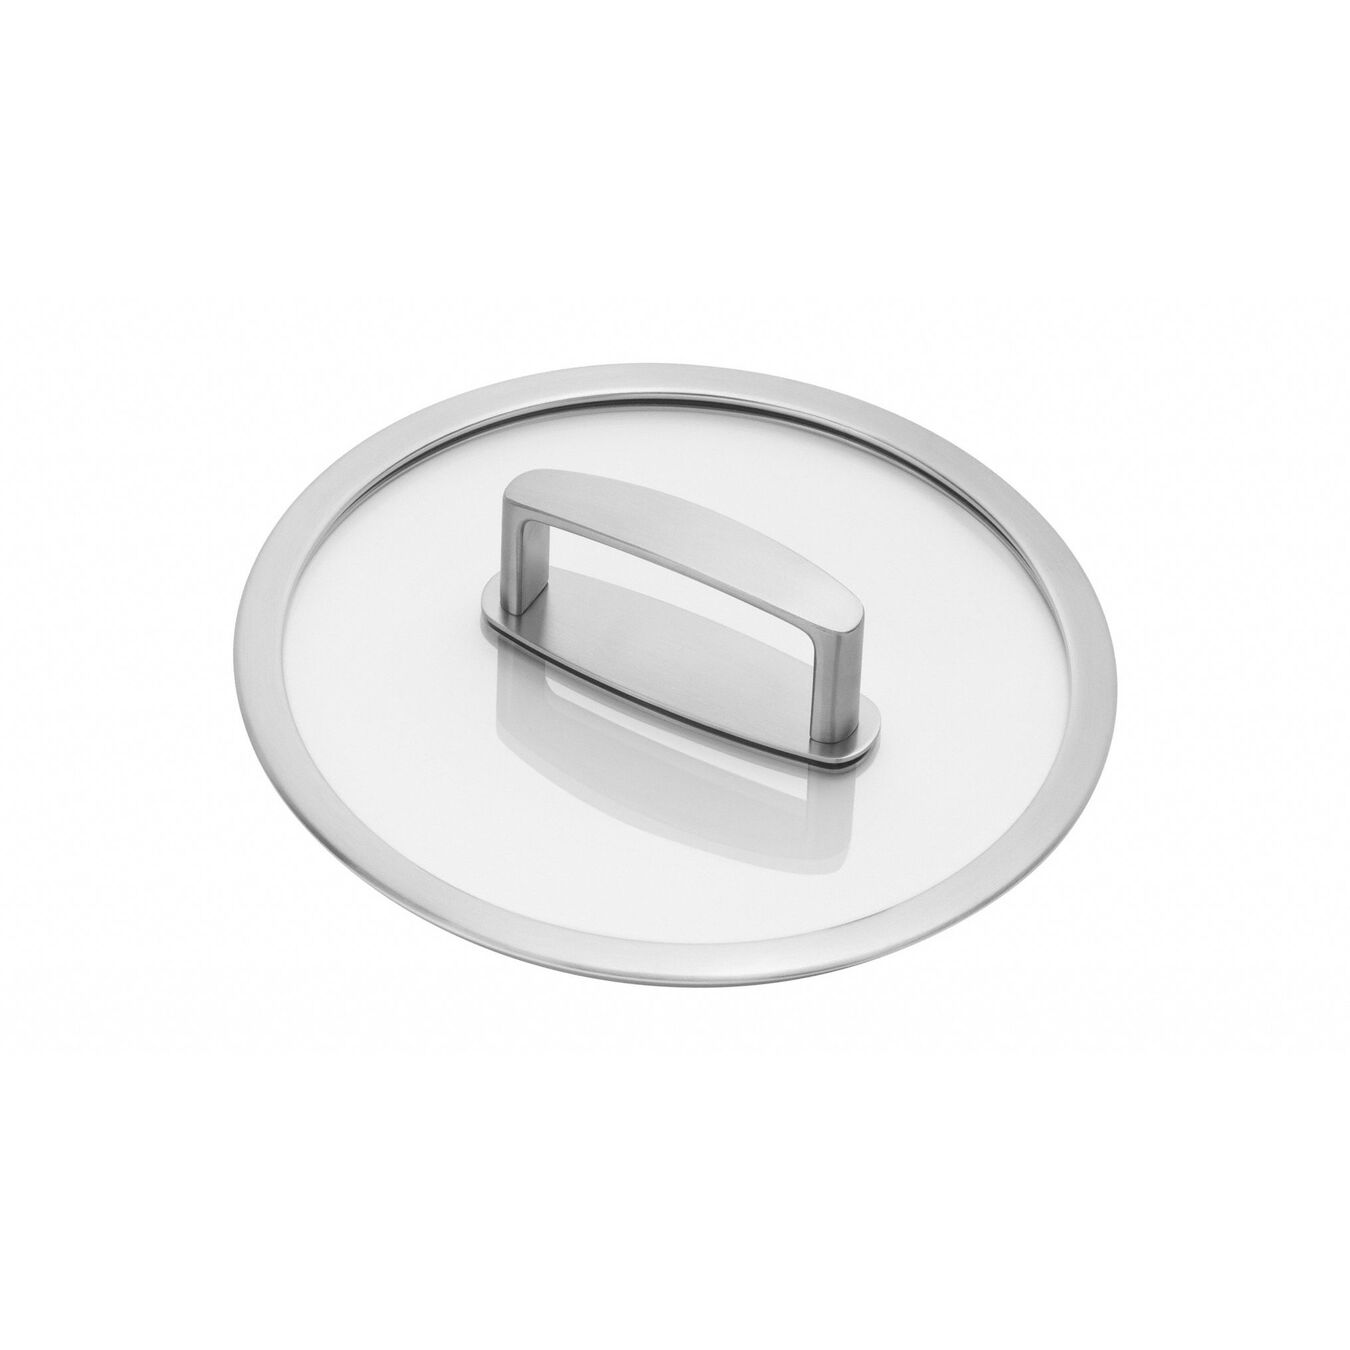 Tencere Seti | 18/10 Paslanmaz Çelik | 5-parça,,large 12